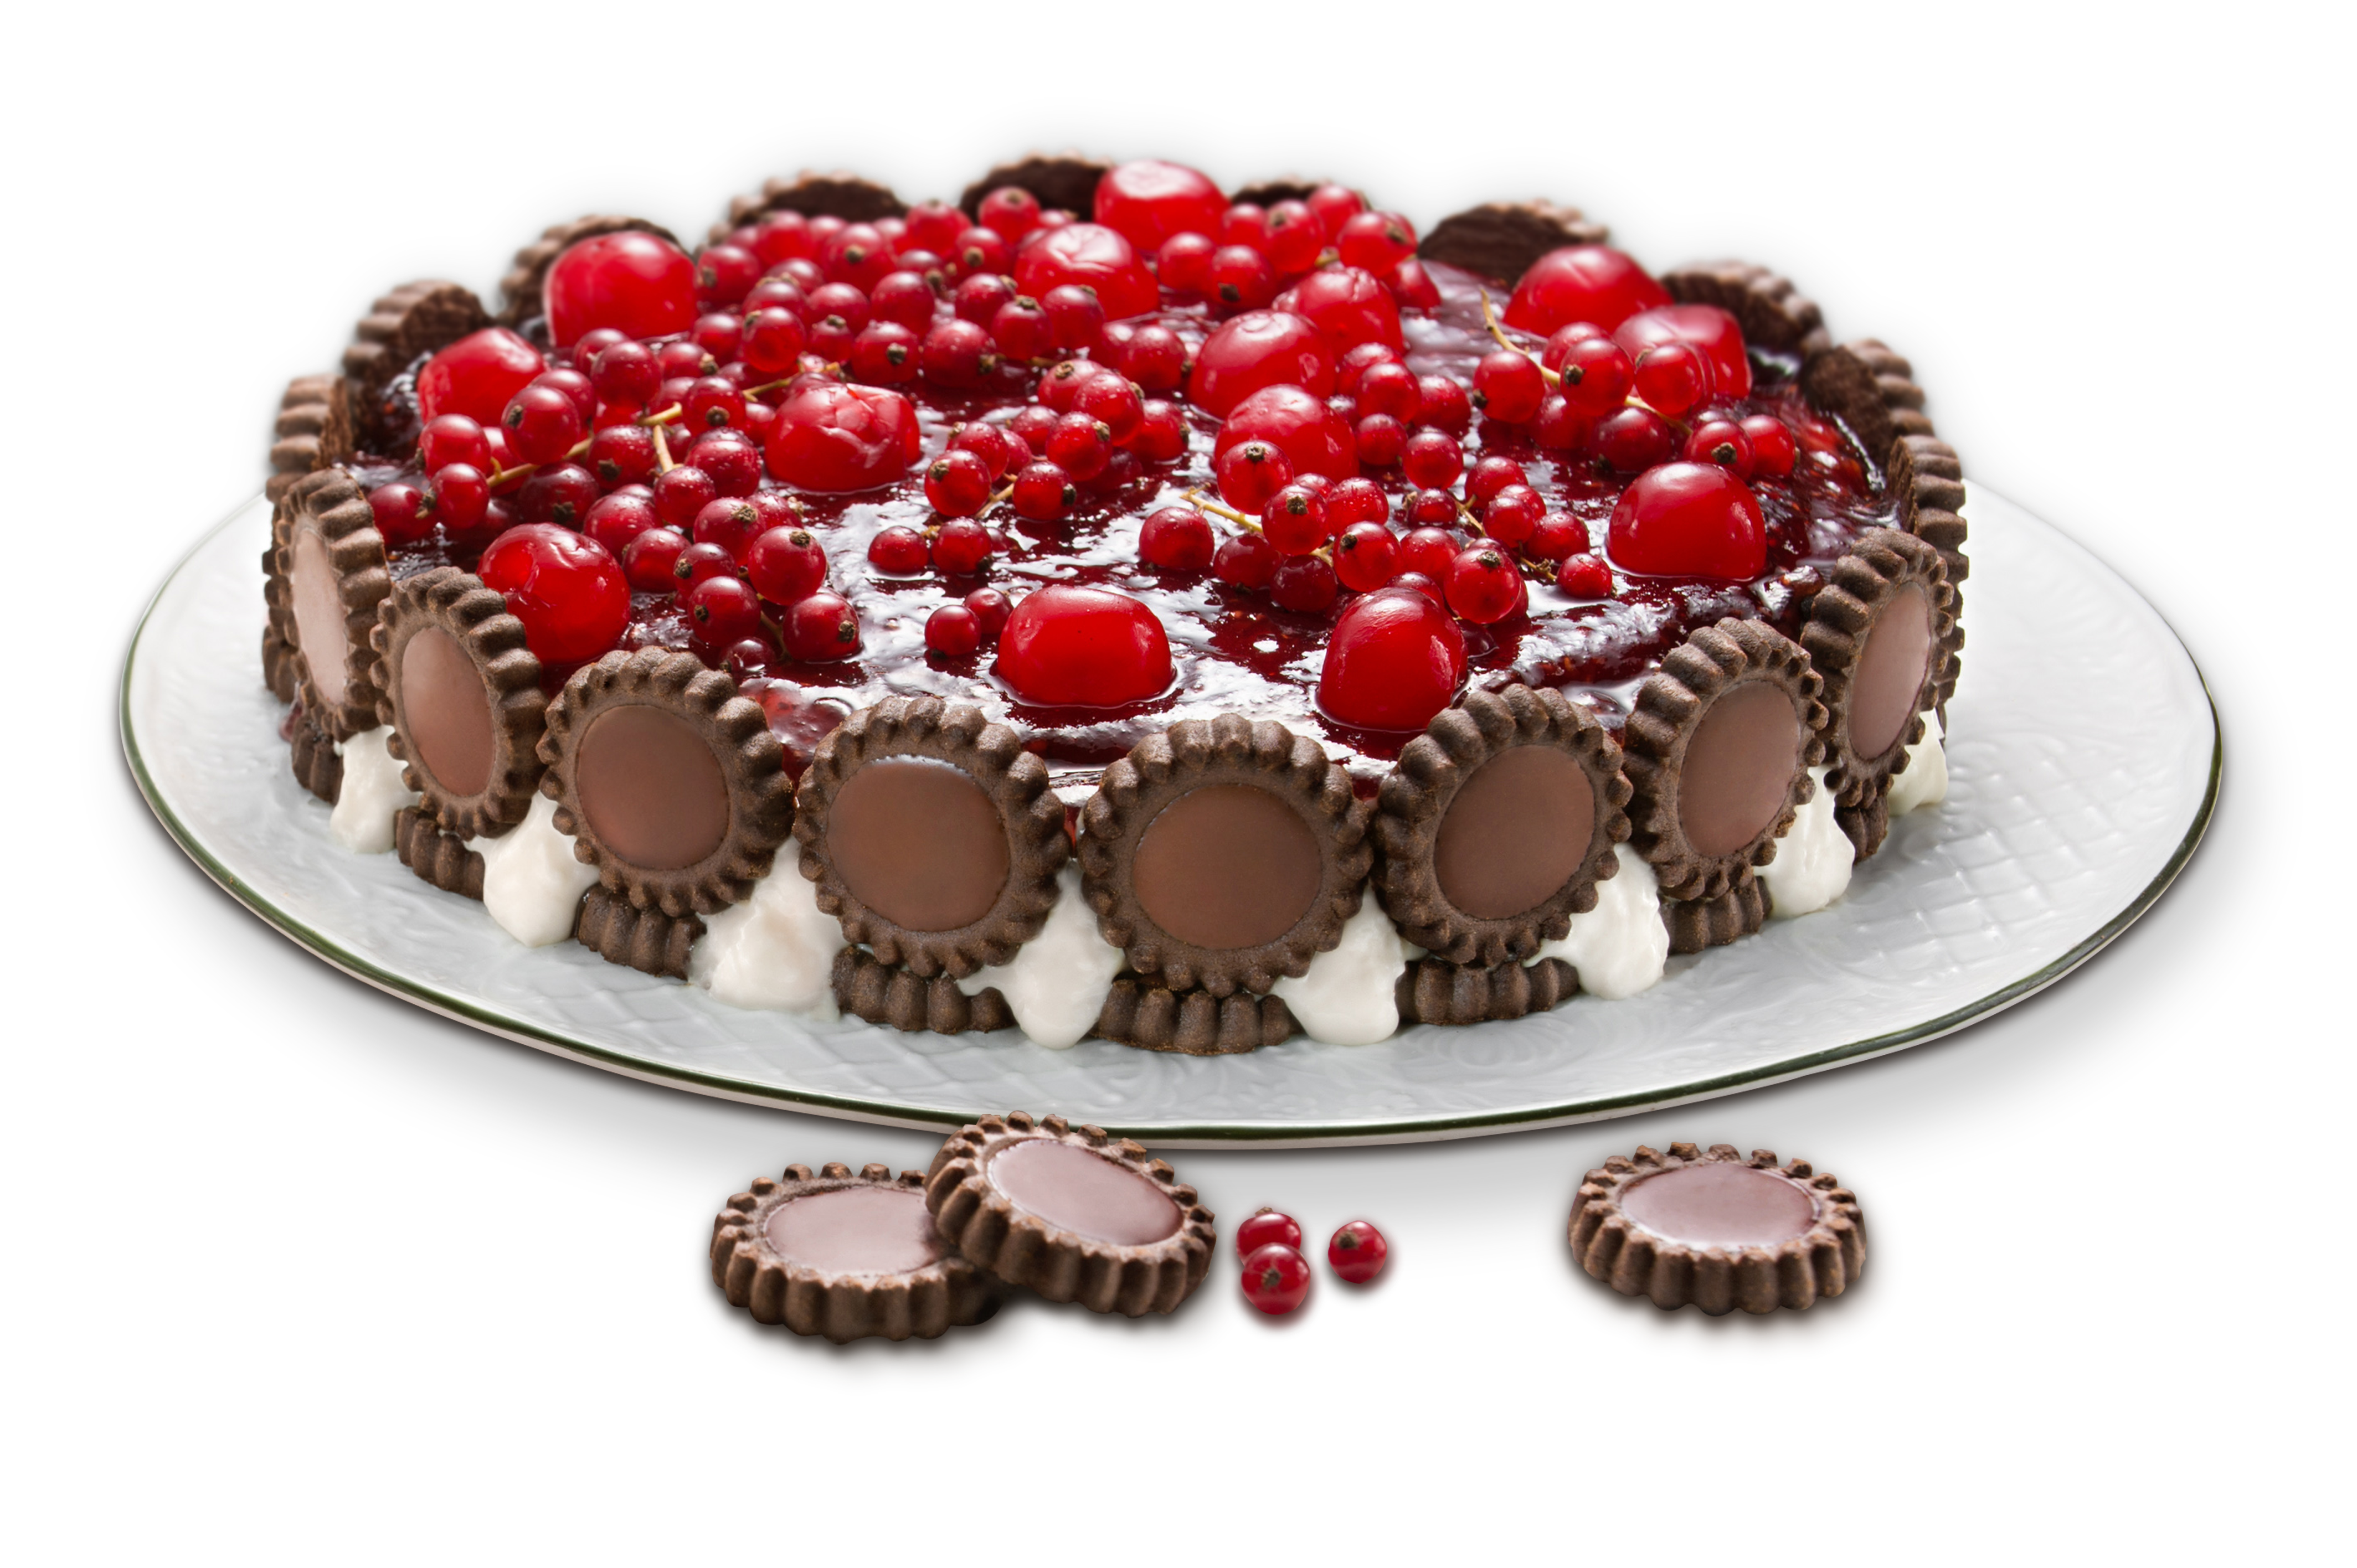 cheesecake tratado-Recuperado